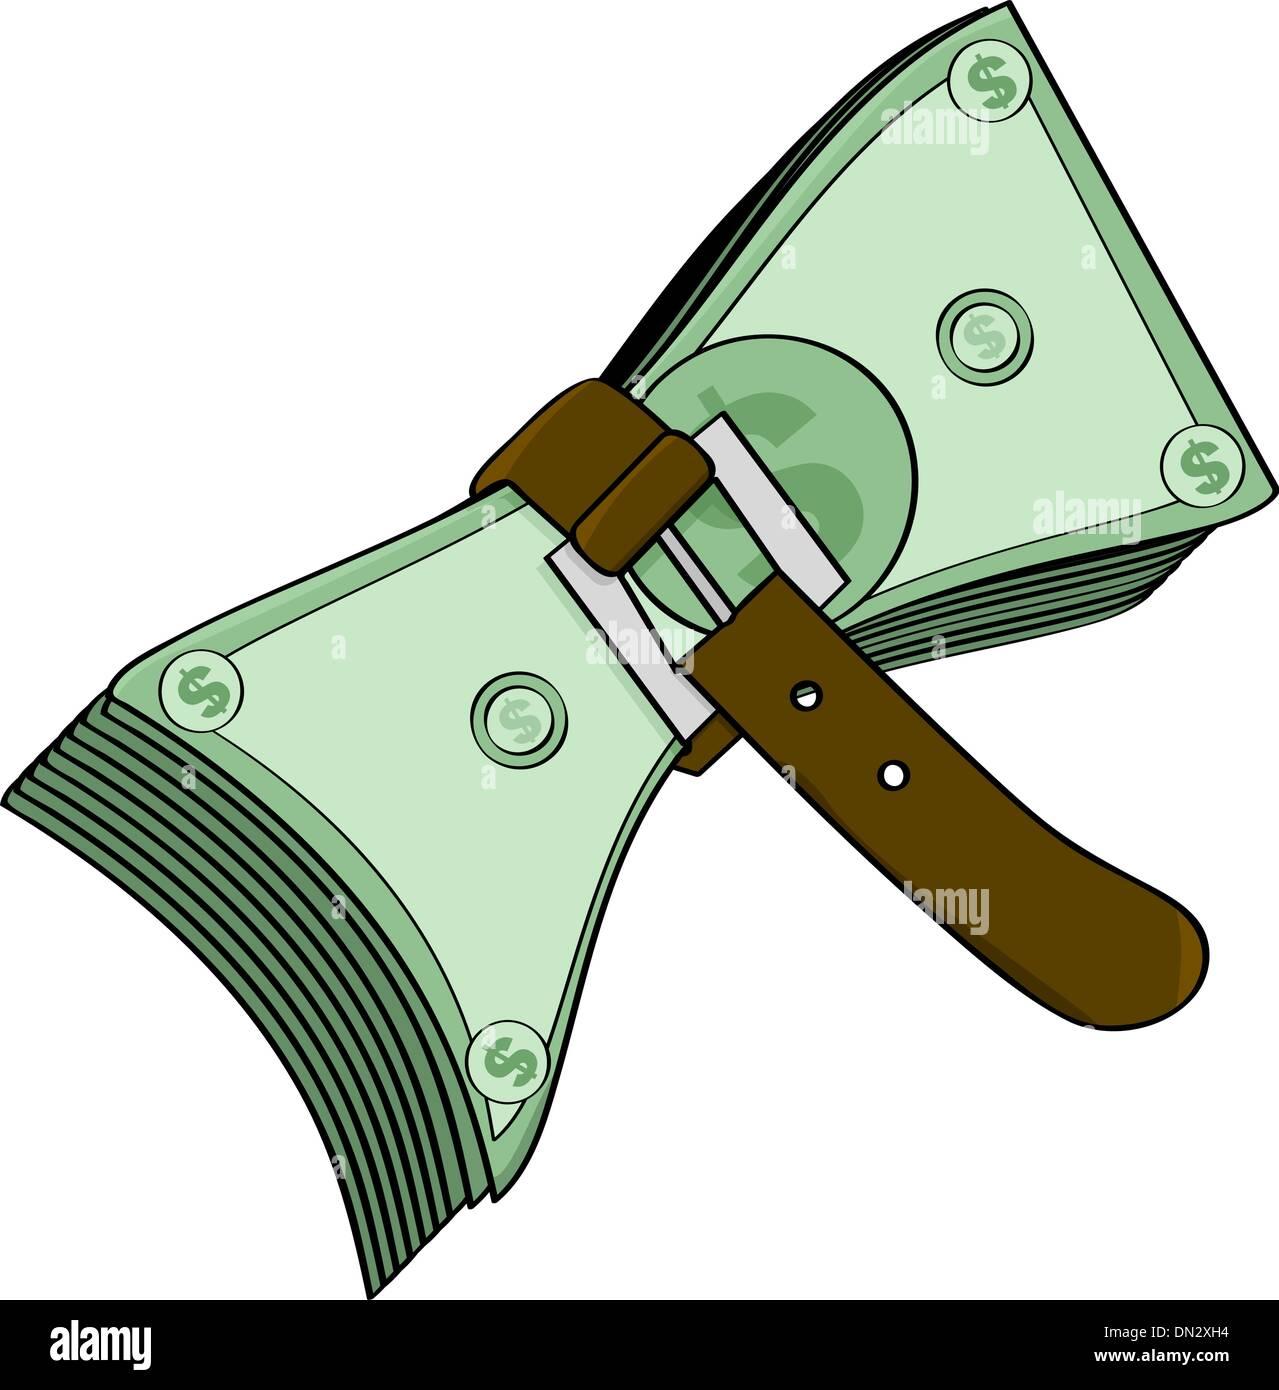 Tight money - Stock Image